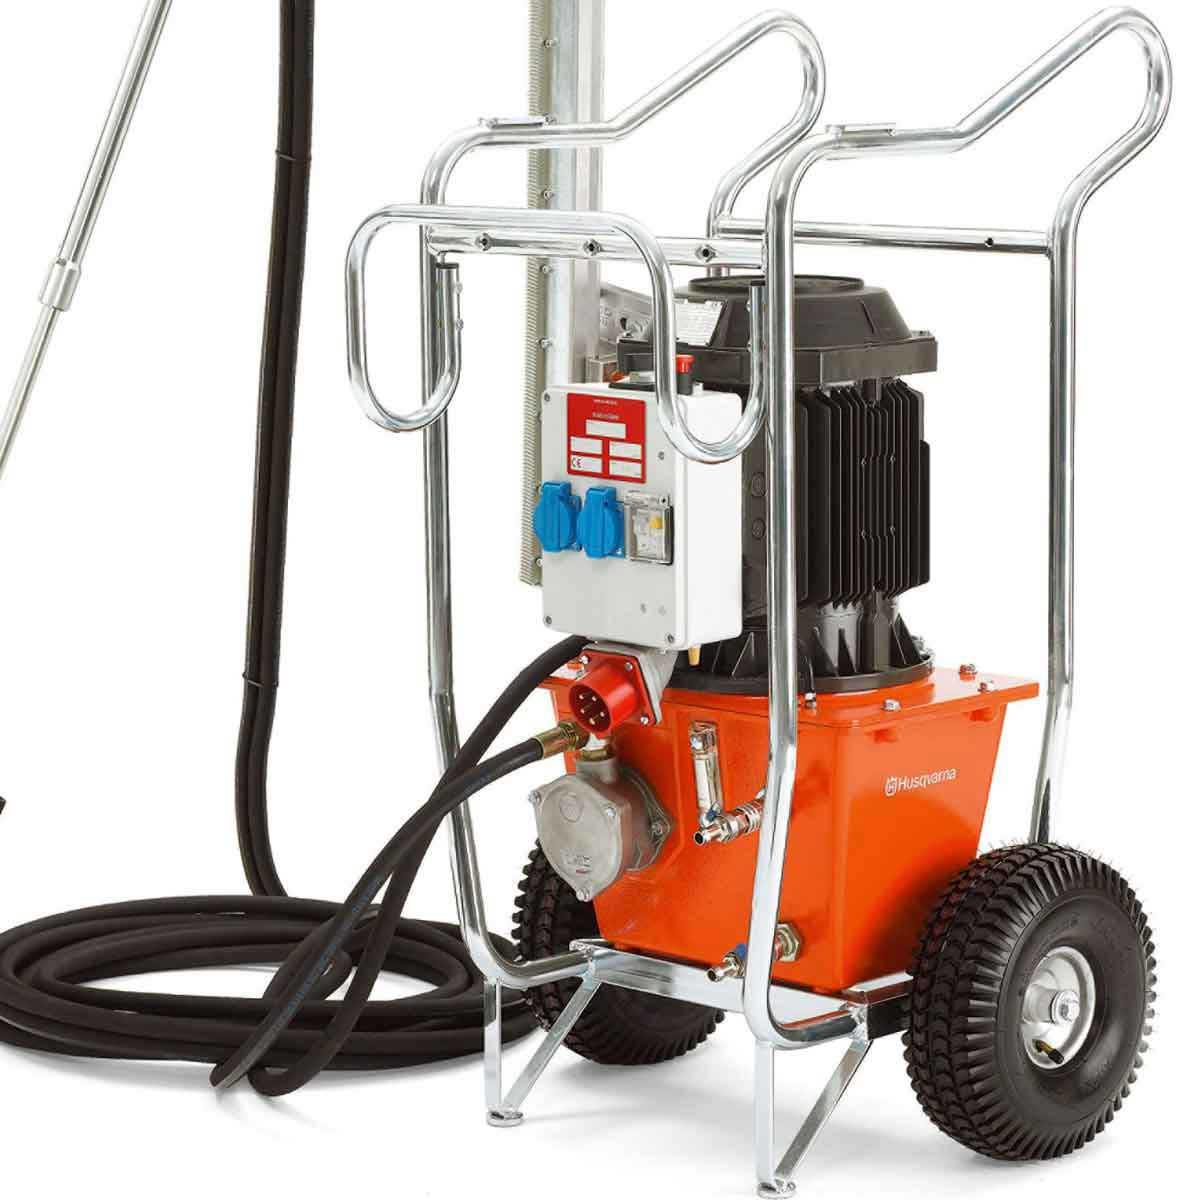 Husqvarna Electric Hydraulic Power Pack on Cart 965156406